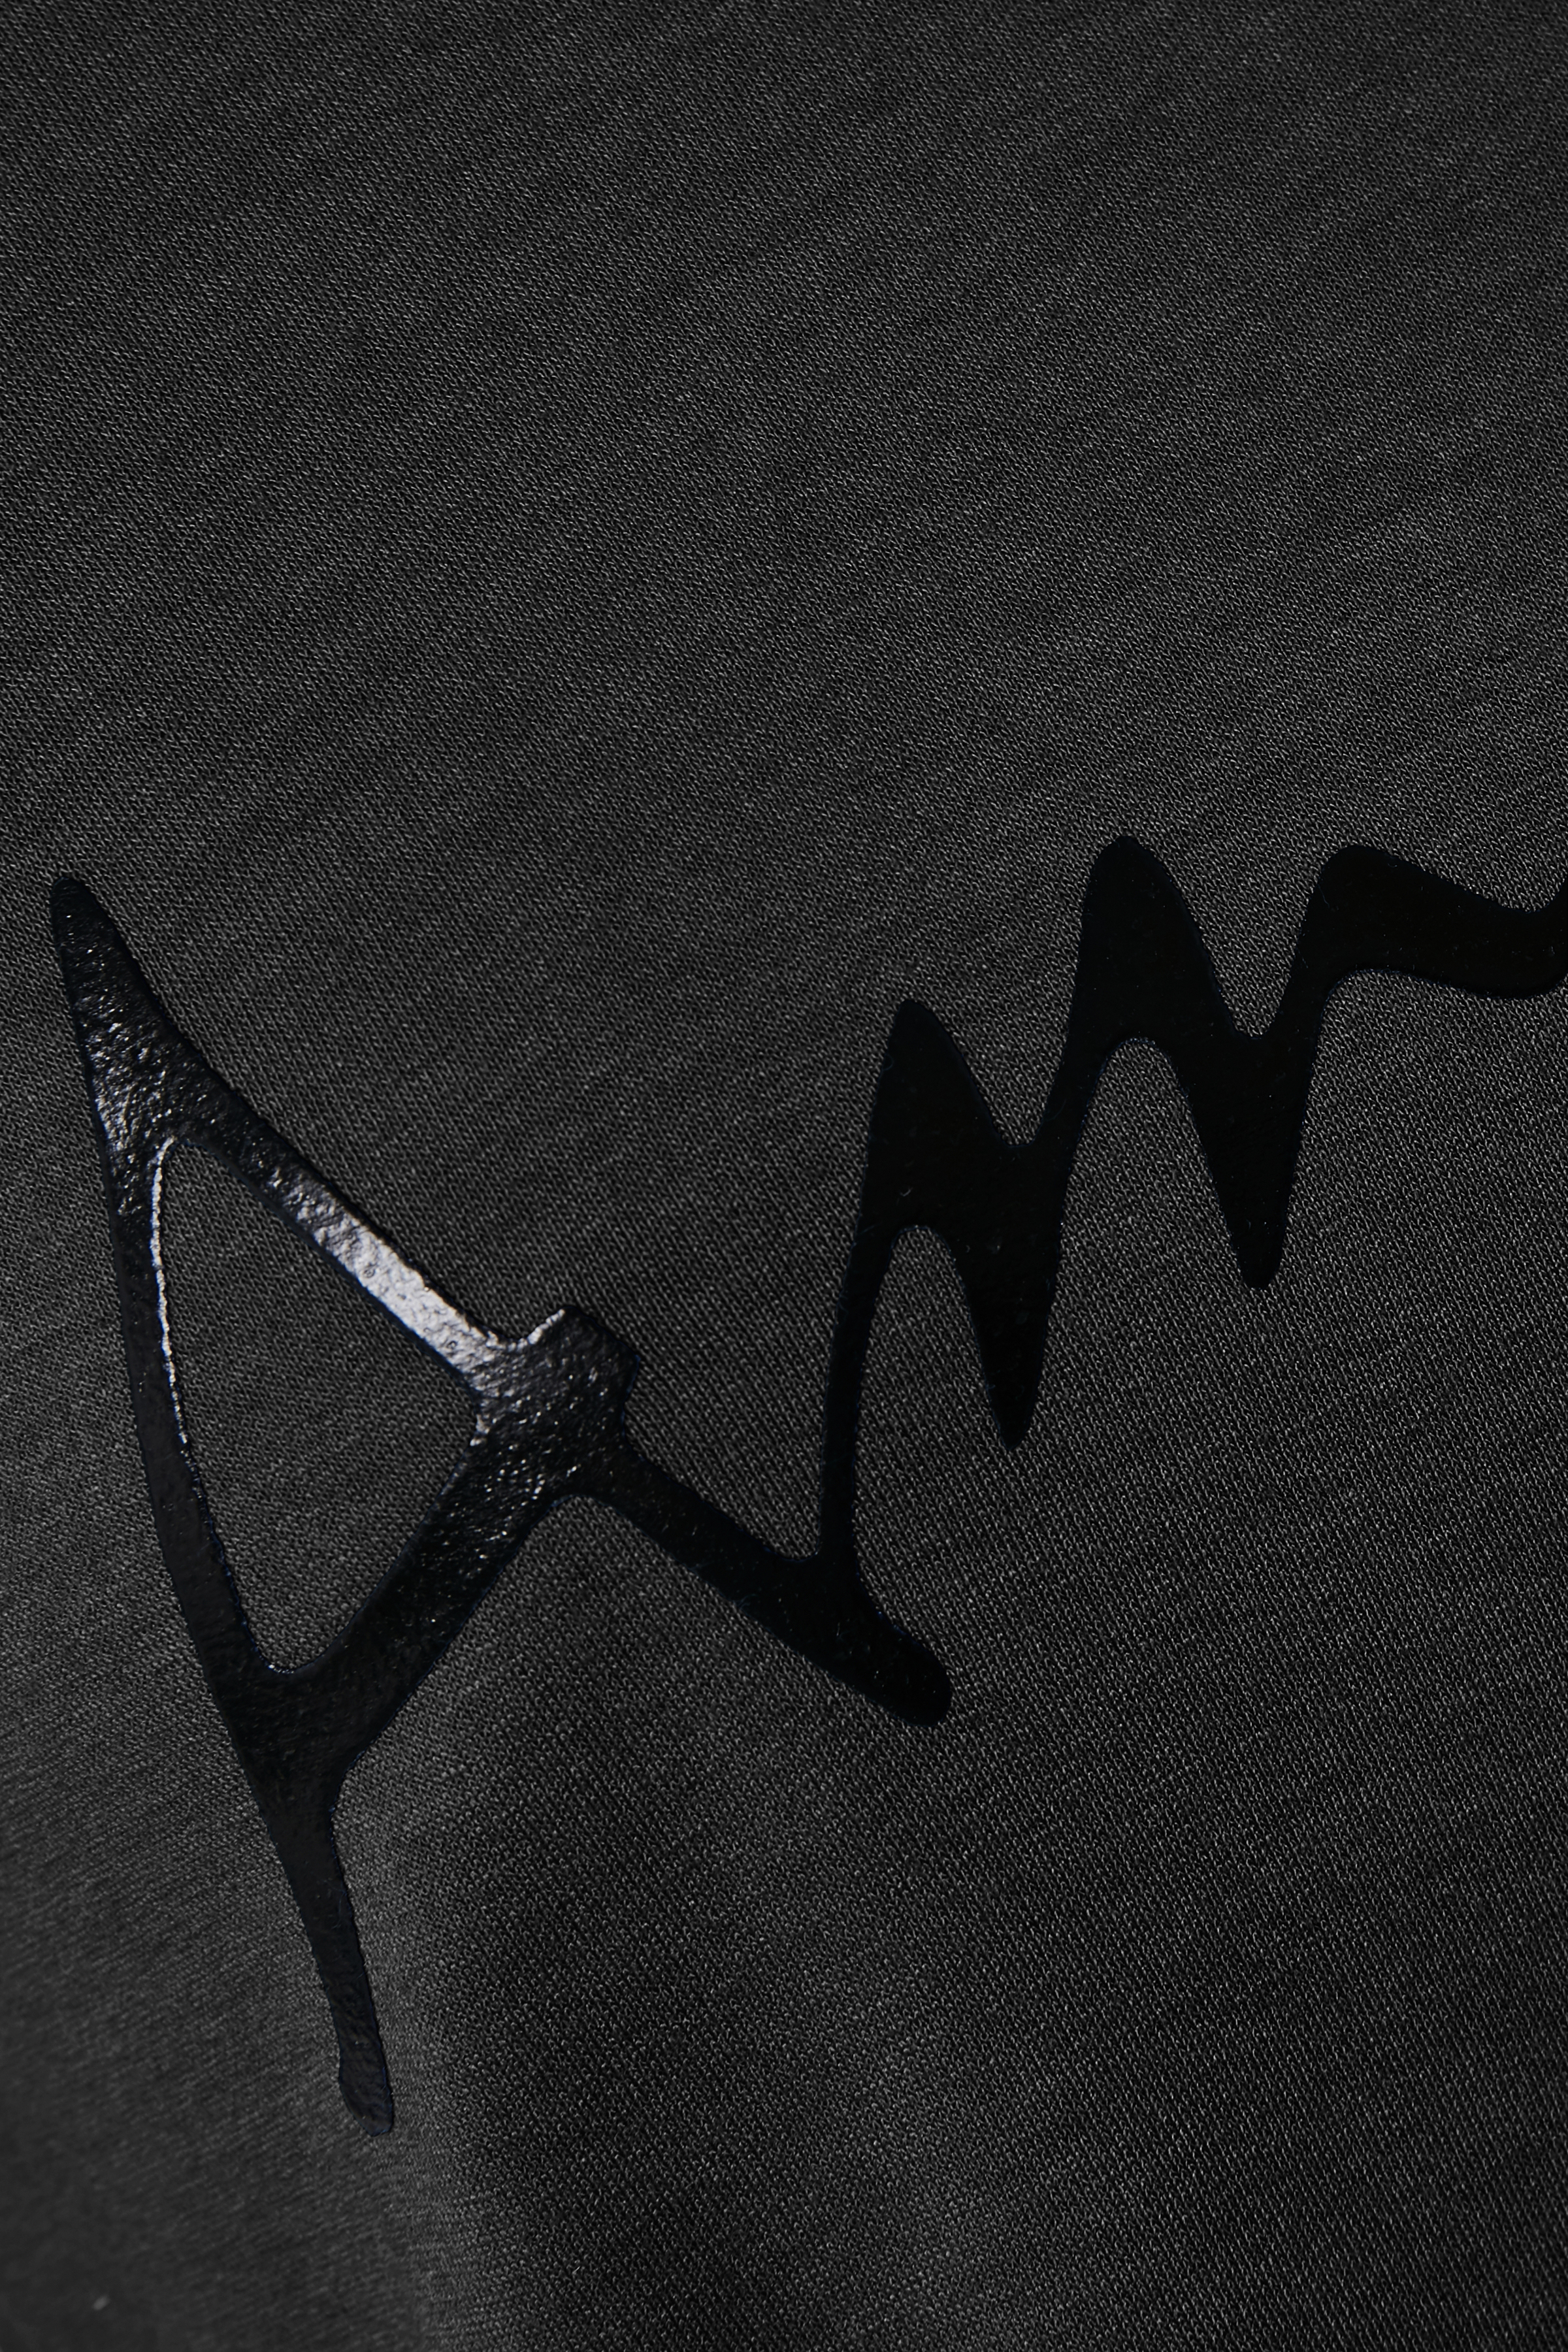 Svart Kortärmad T-shirt från Bon'A Parte – Köp Svart Kortärmad T-shirt från stl. S-2XL här